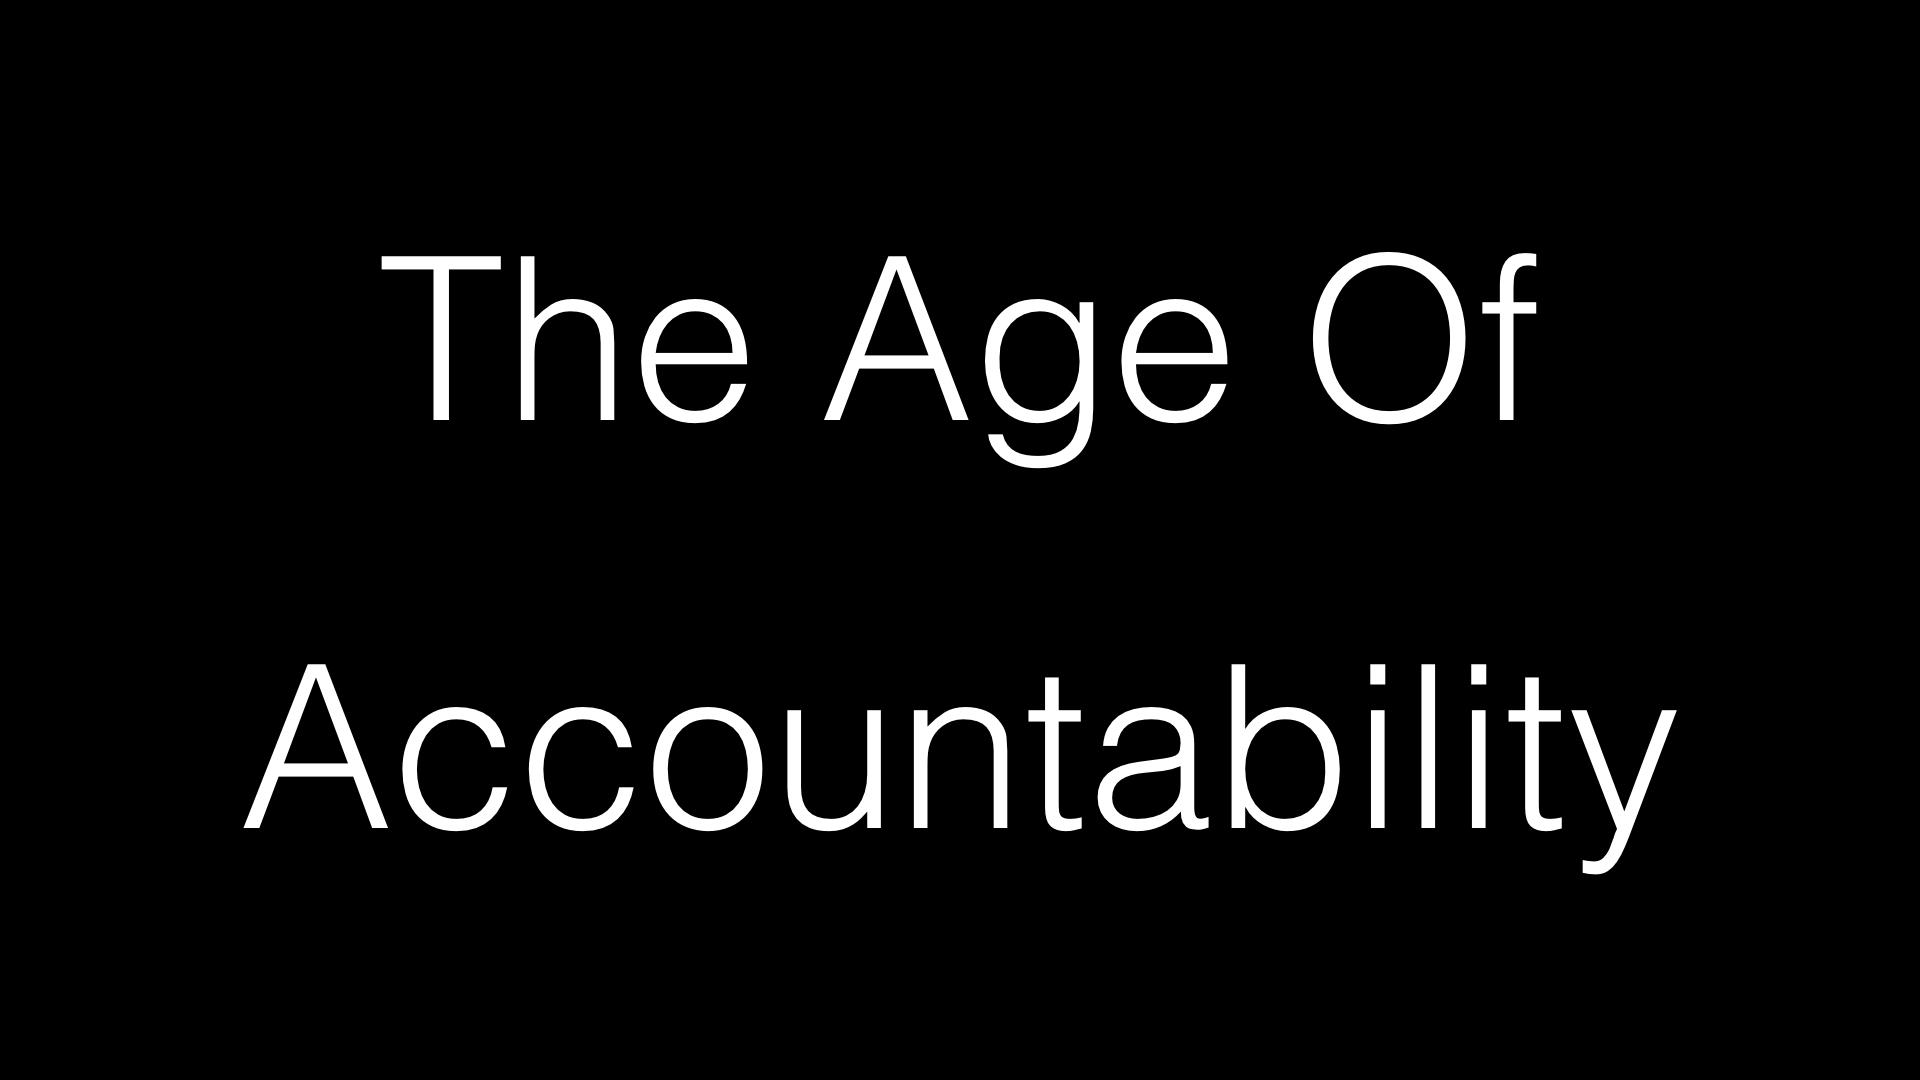 Age Of Accountability WIDE.001.jpeg